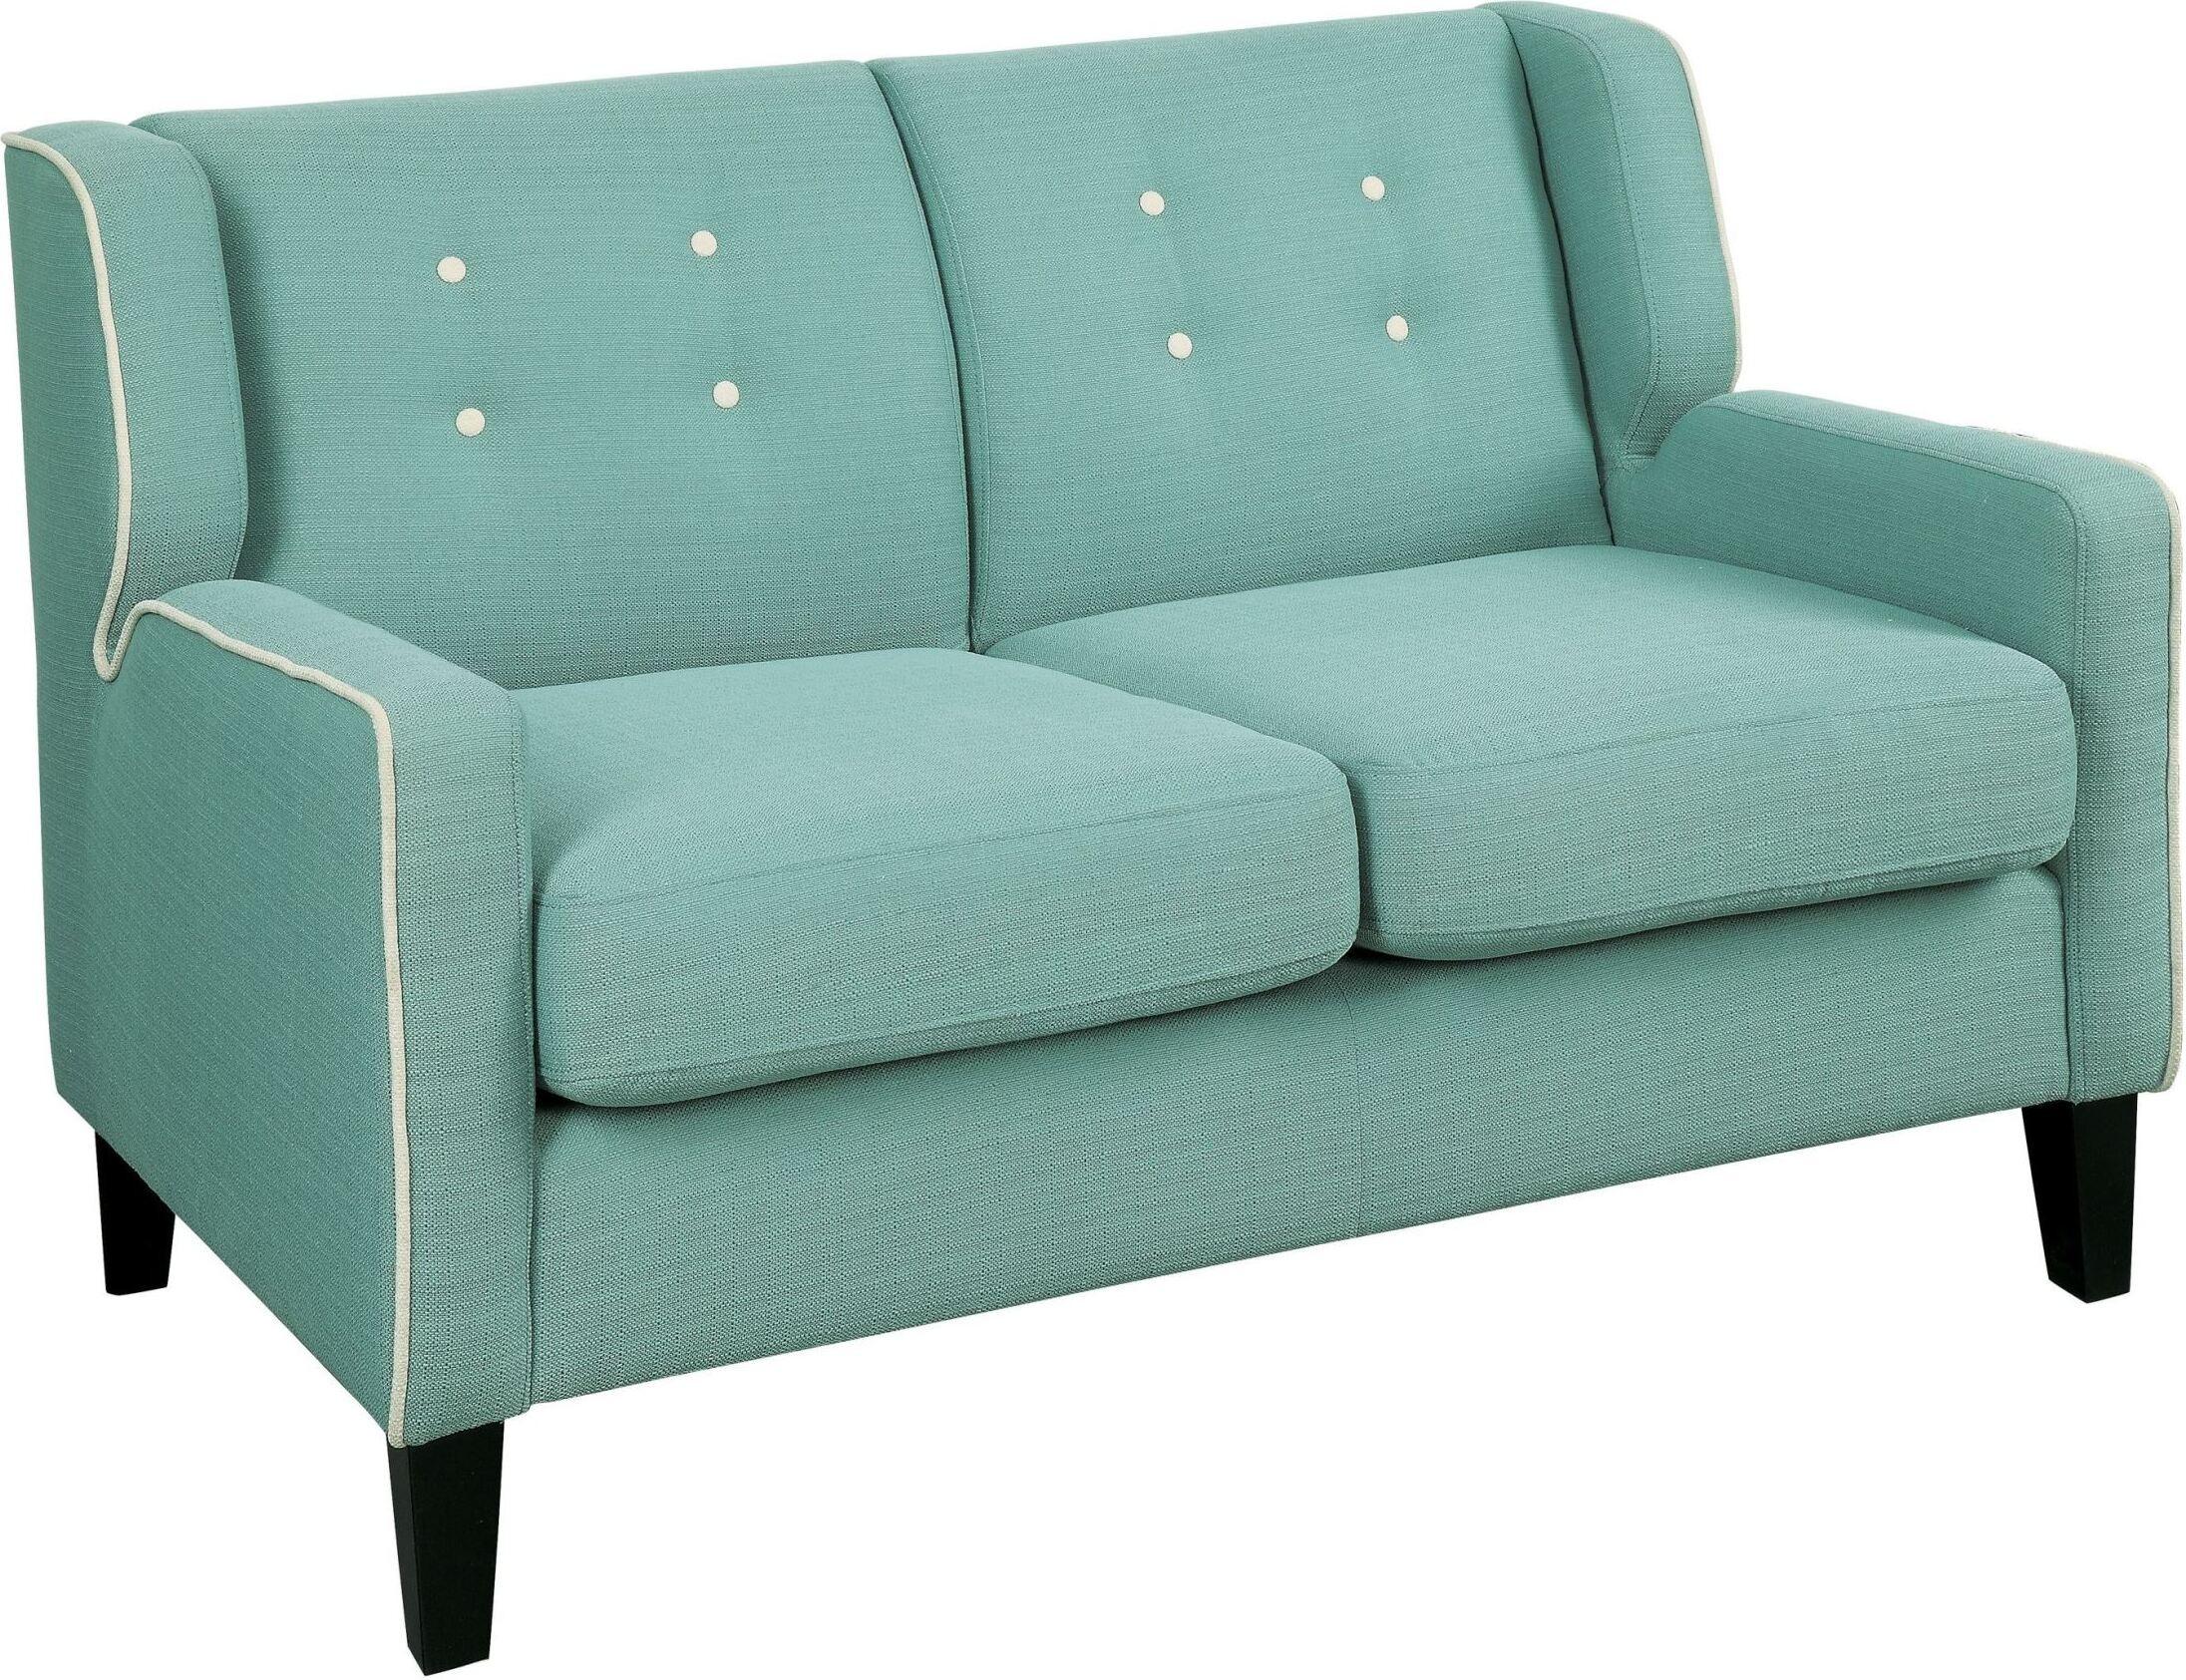 Amazing Roweena Teal Accent Chair Lamtechconsult Wood Chair Design Ideas Lamtechconsultcom